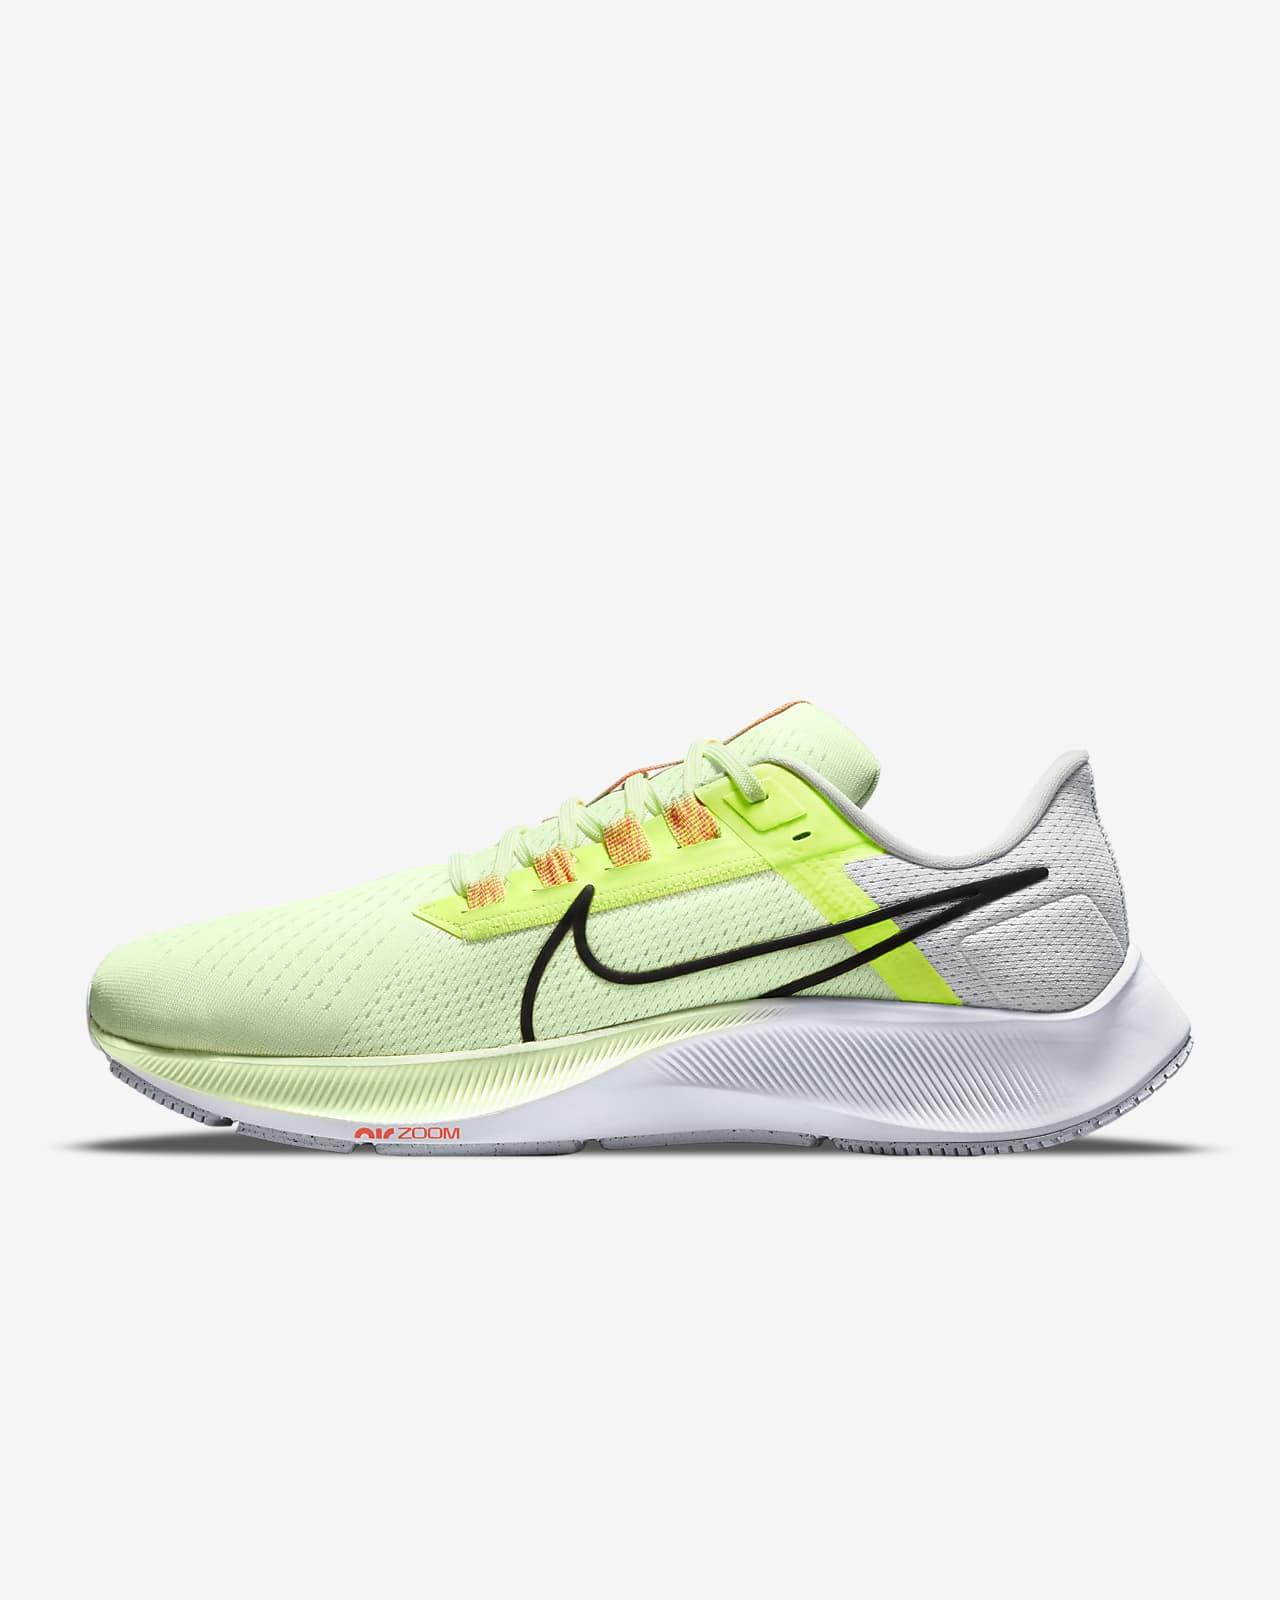 Nike Air Zoom Pegasus 38 Hardloopschoen voor heren (straat)